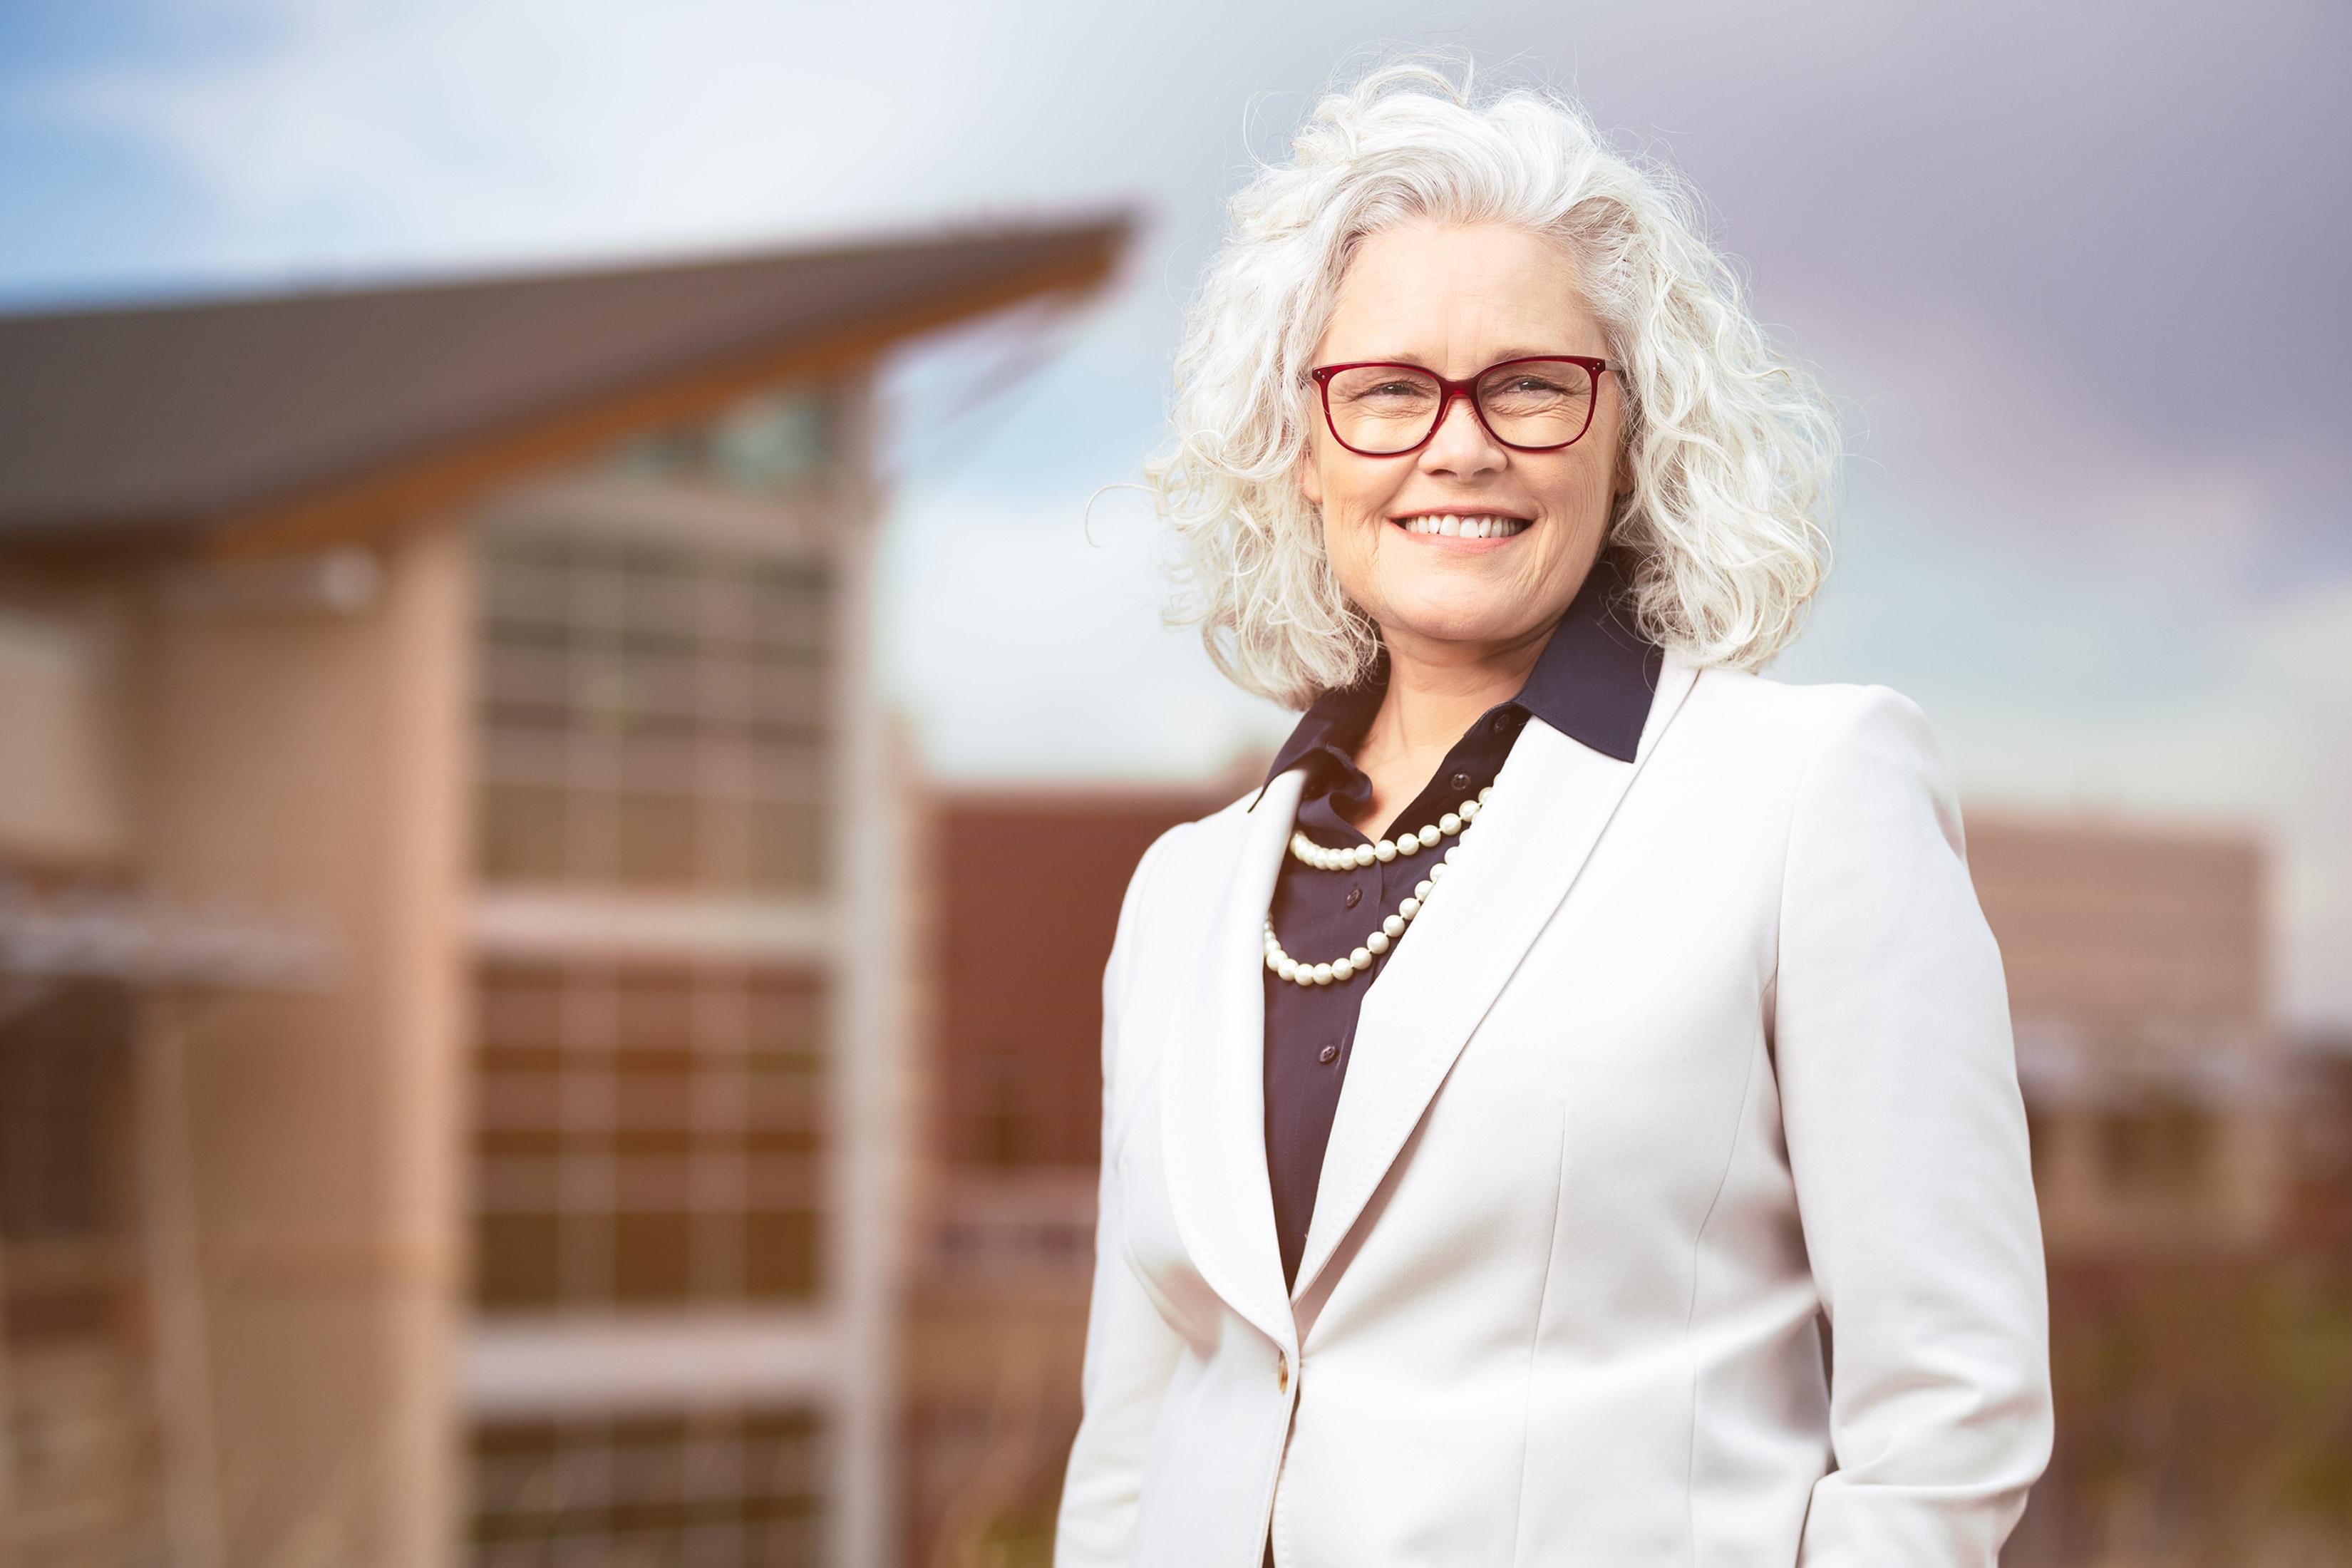 The Appraisal Foundation Vice President Lisa Desmarais